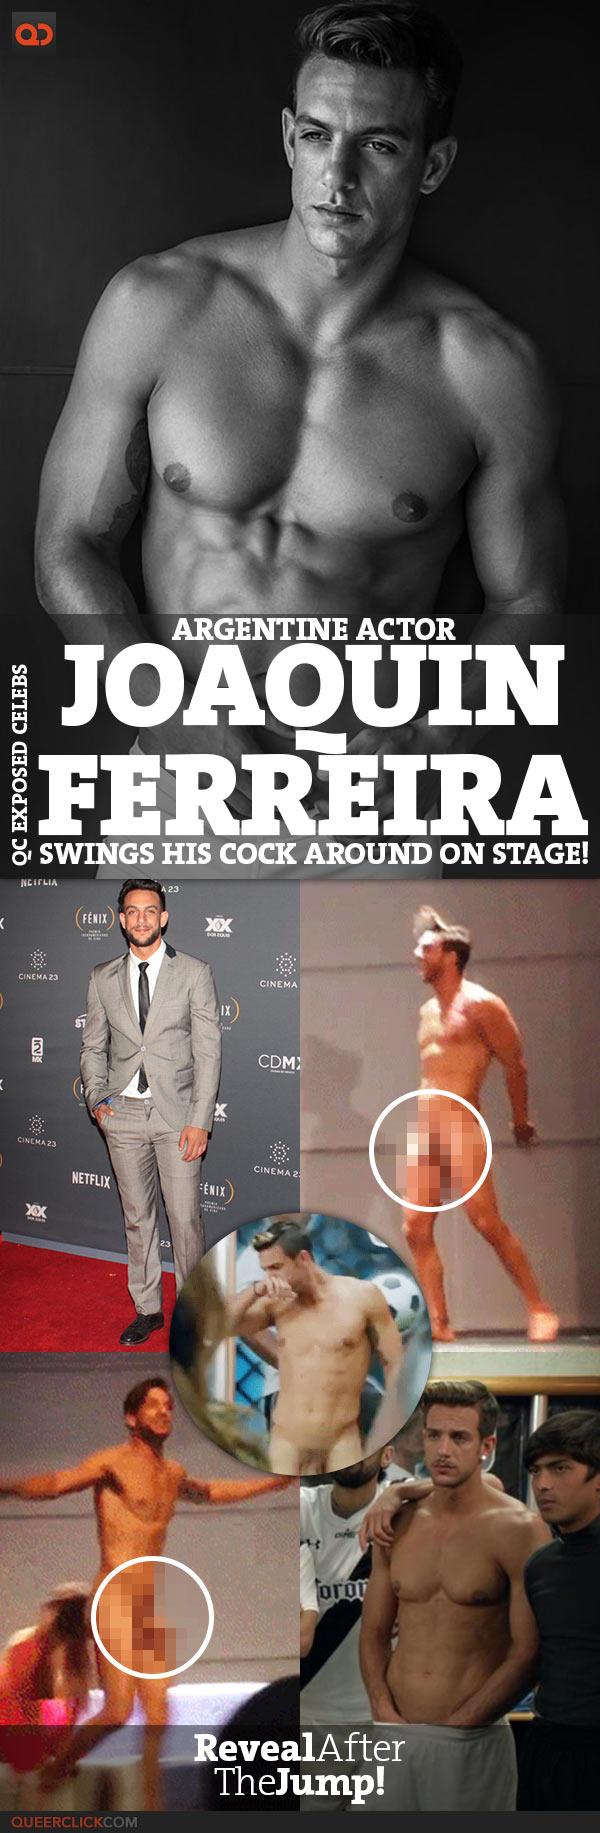 Argentina Boys Gays Porno joaquín ferreira, argentine actor, swings his cock around on